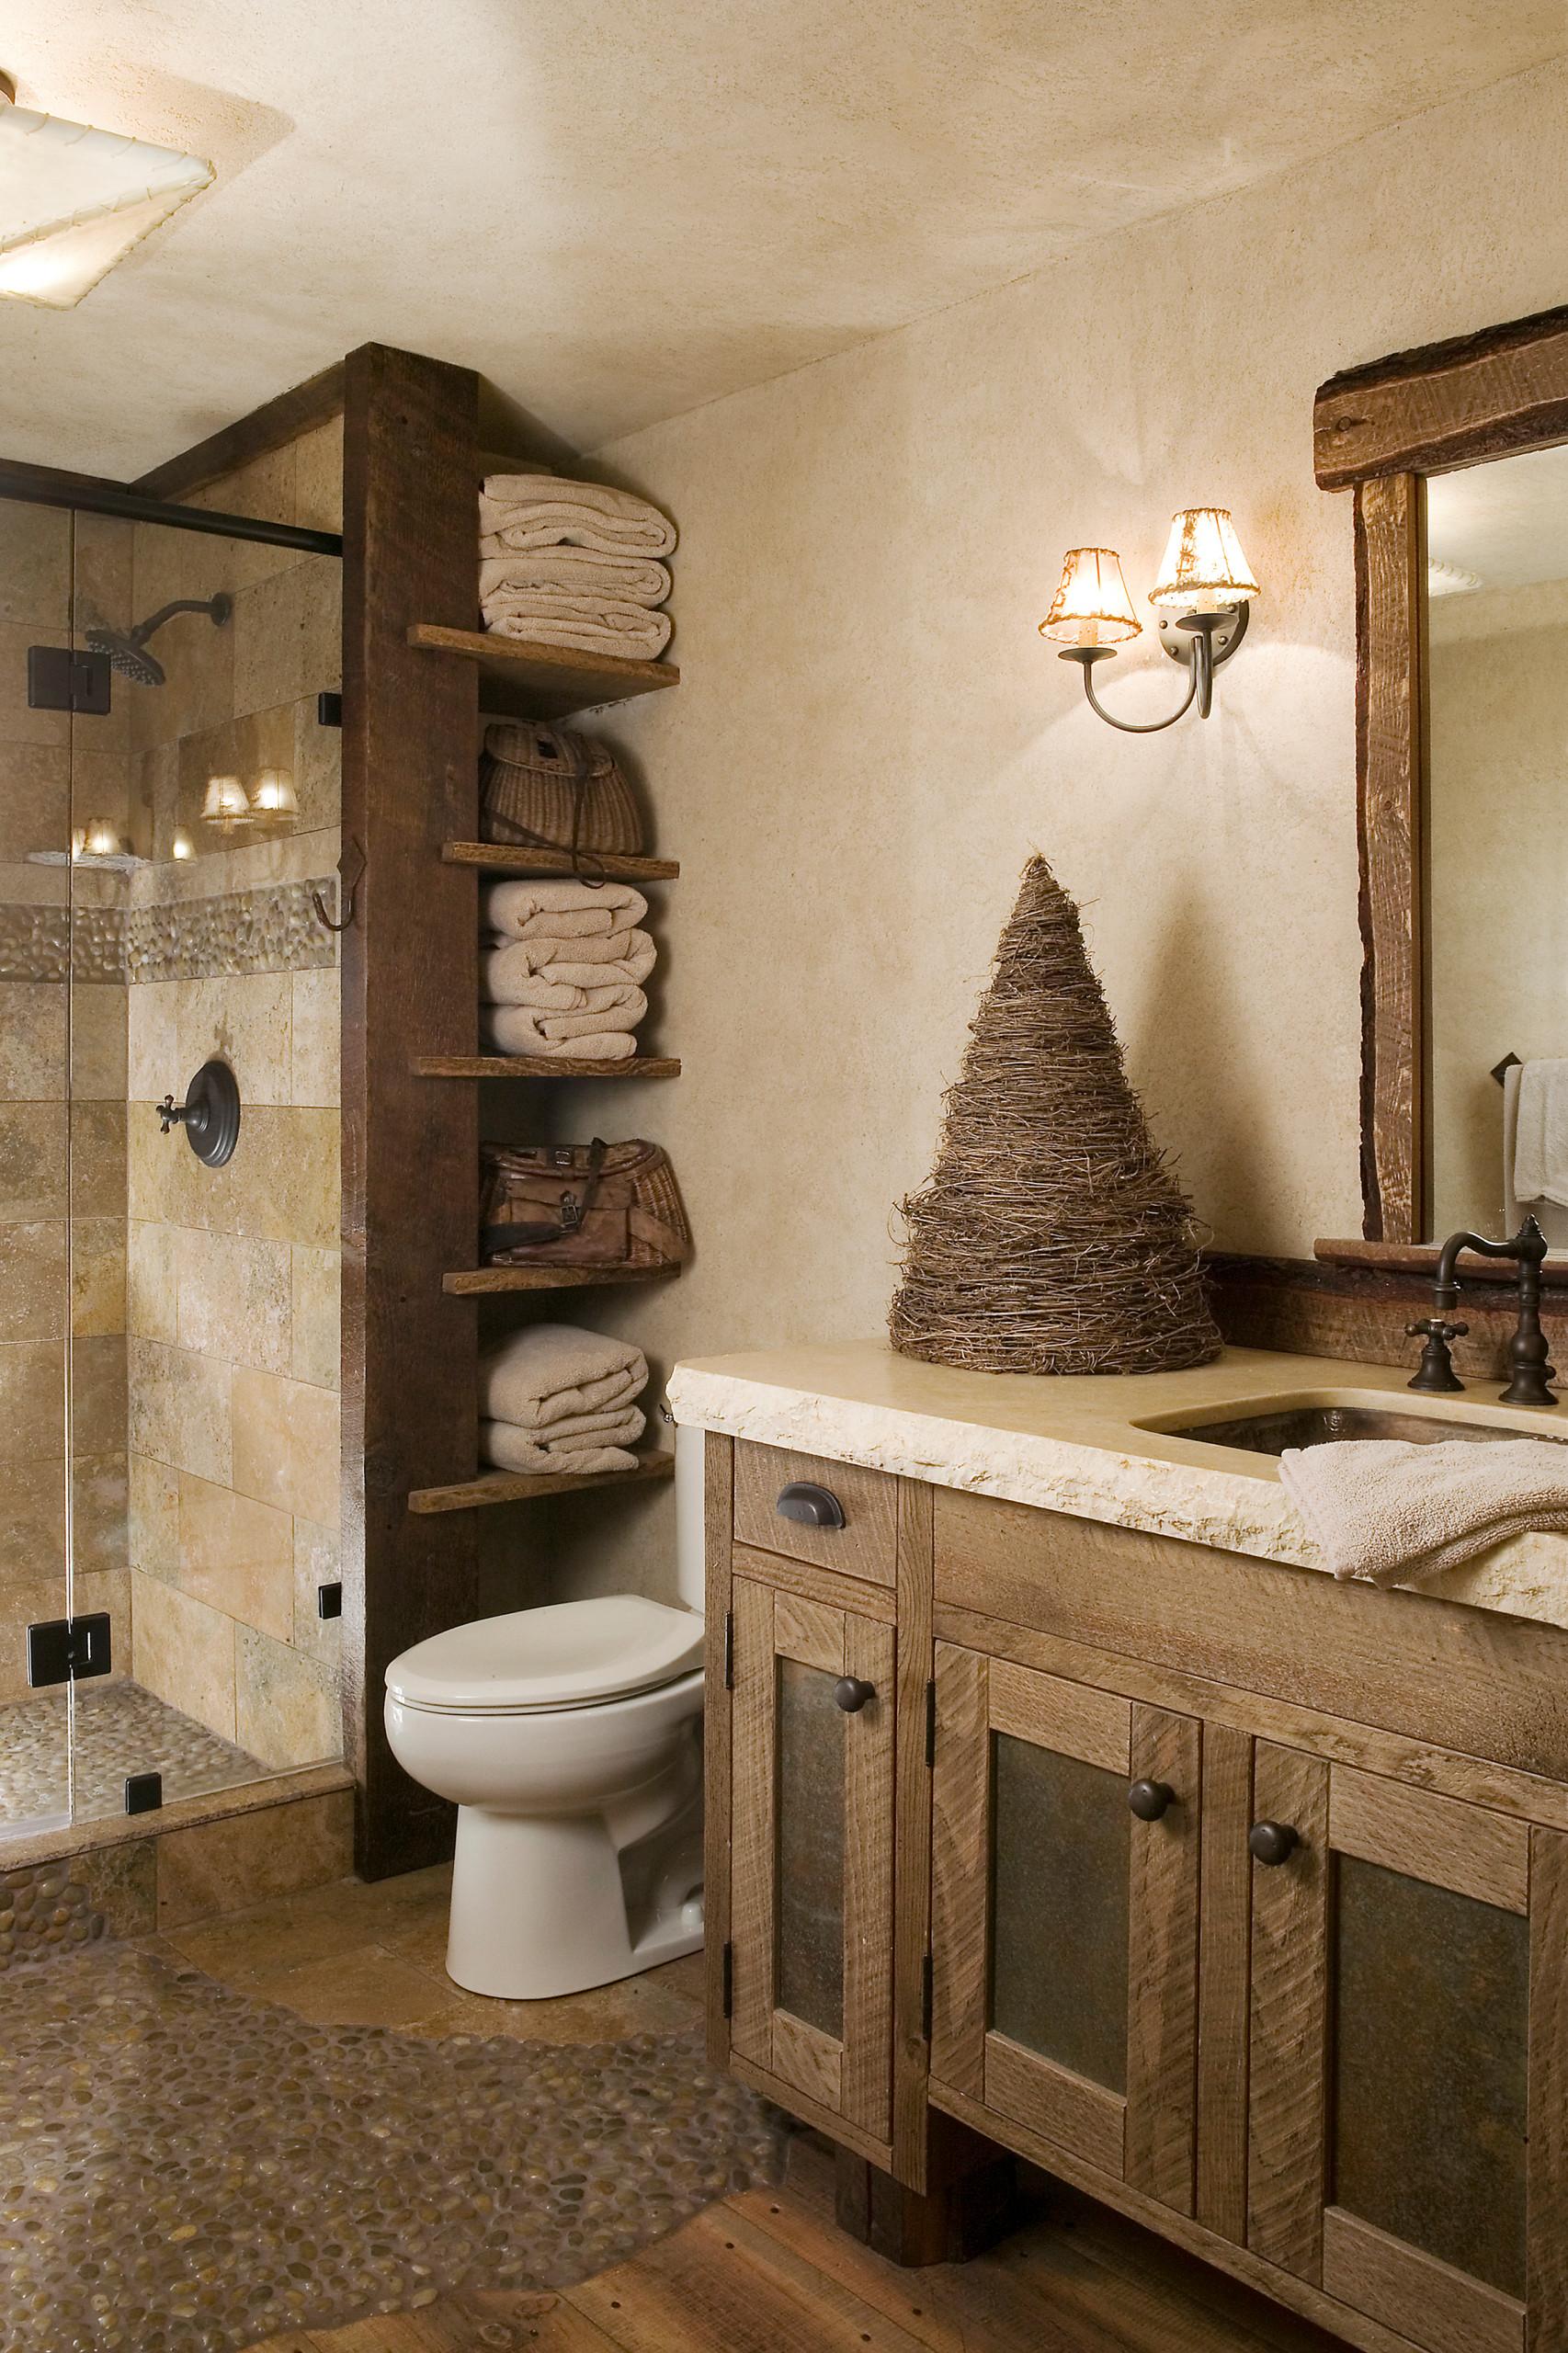 75 Beautiful Rustic Bathroom Design Ideas Pictures Houzz